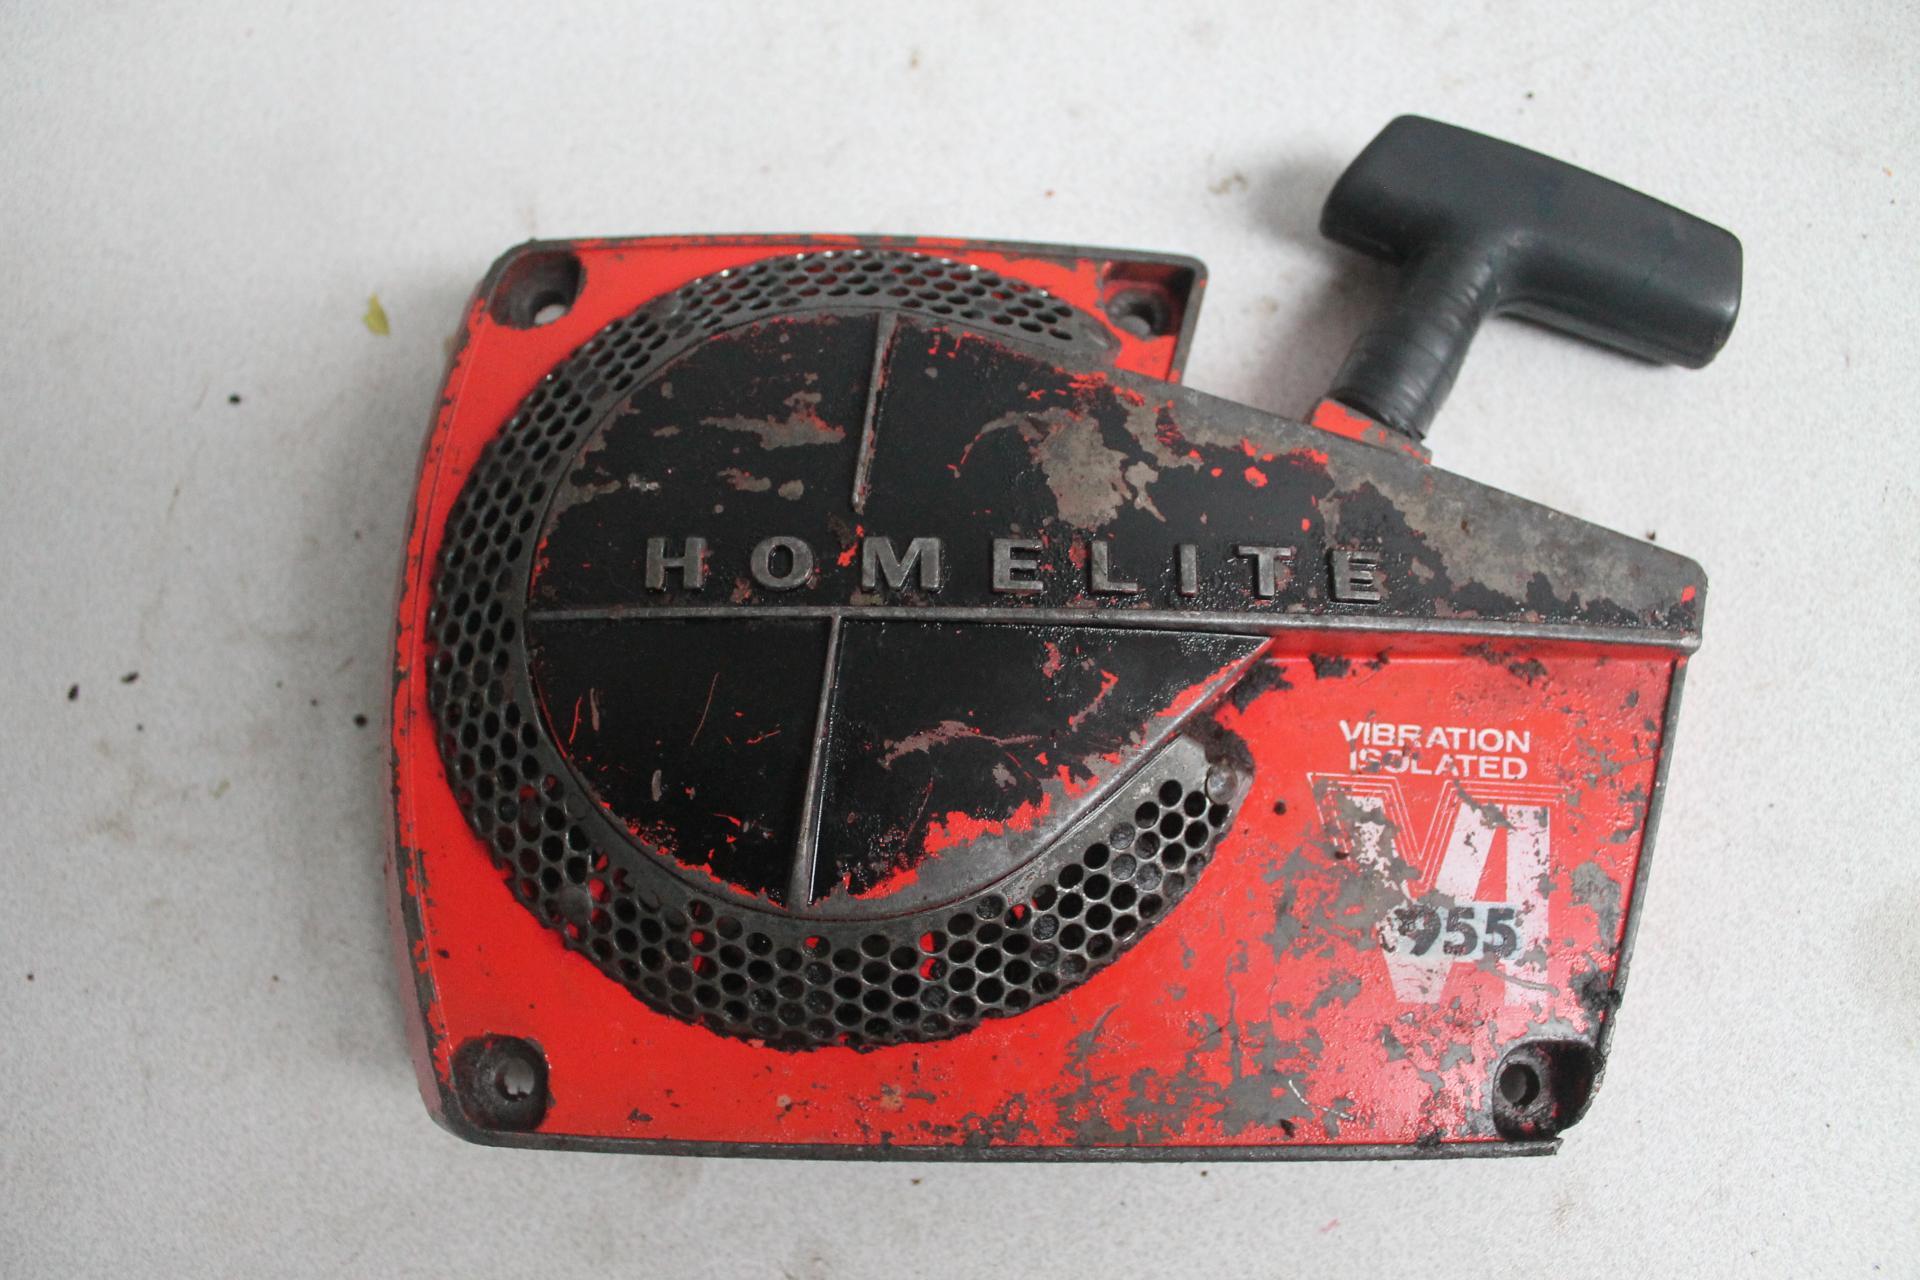 Arranque Homelite 955